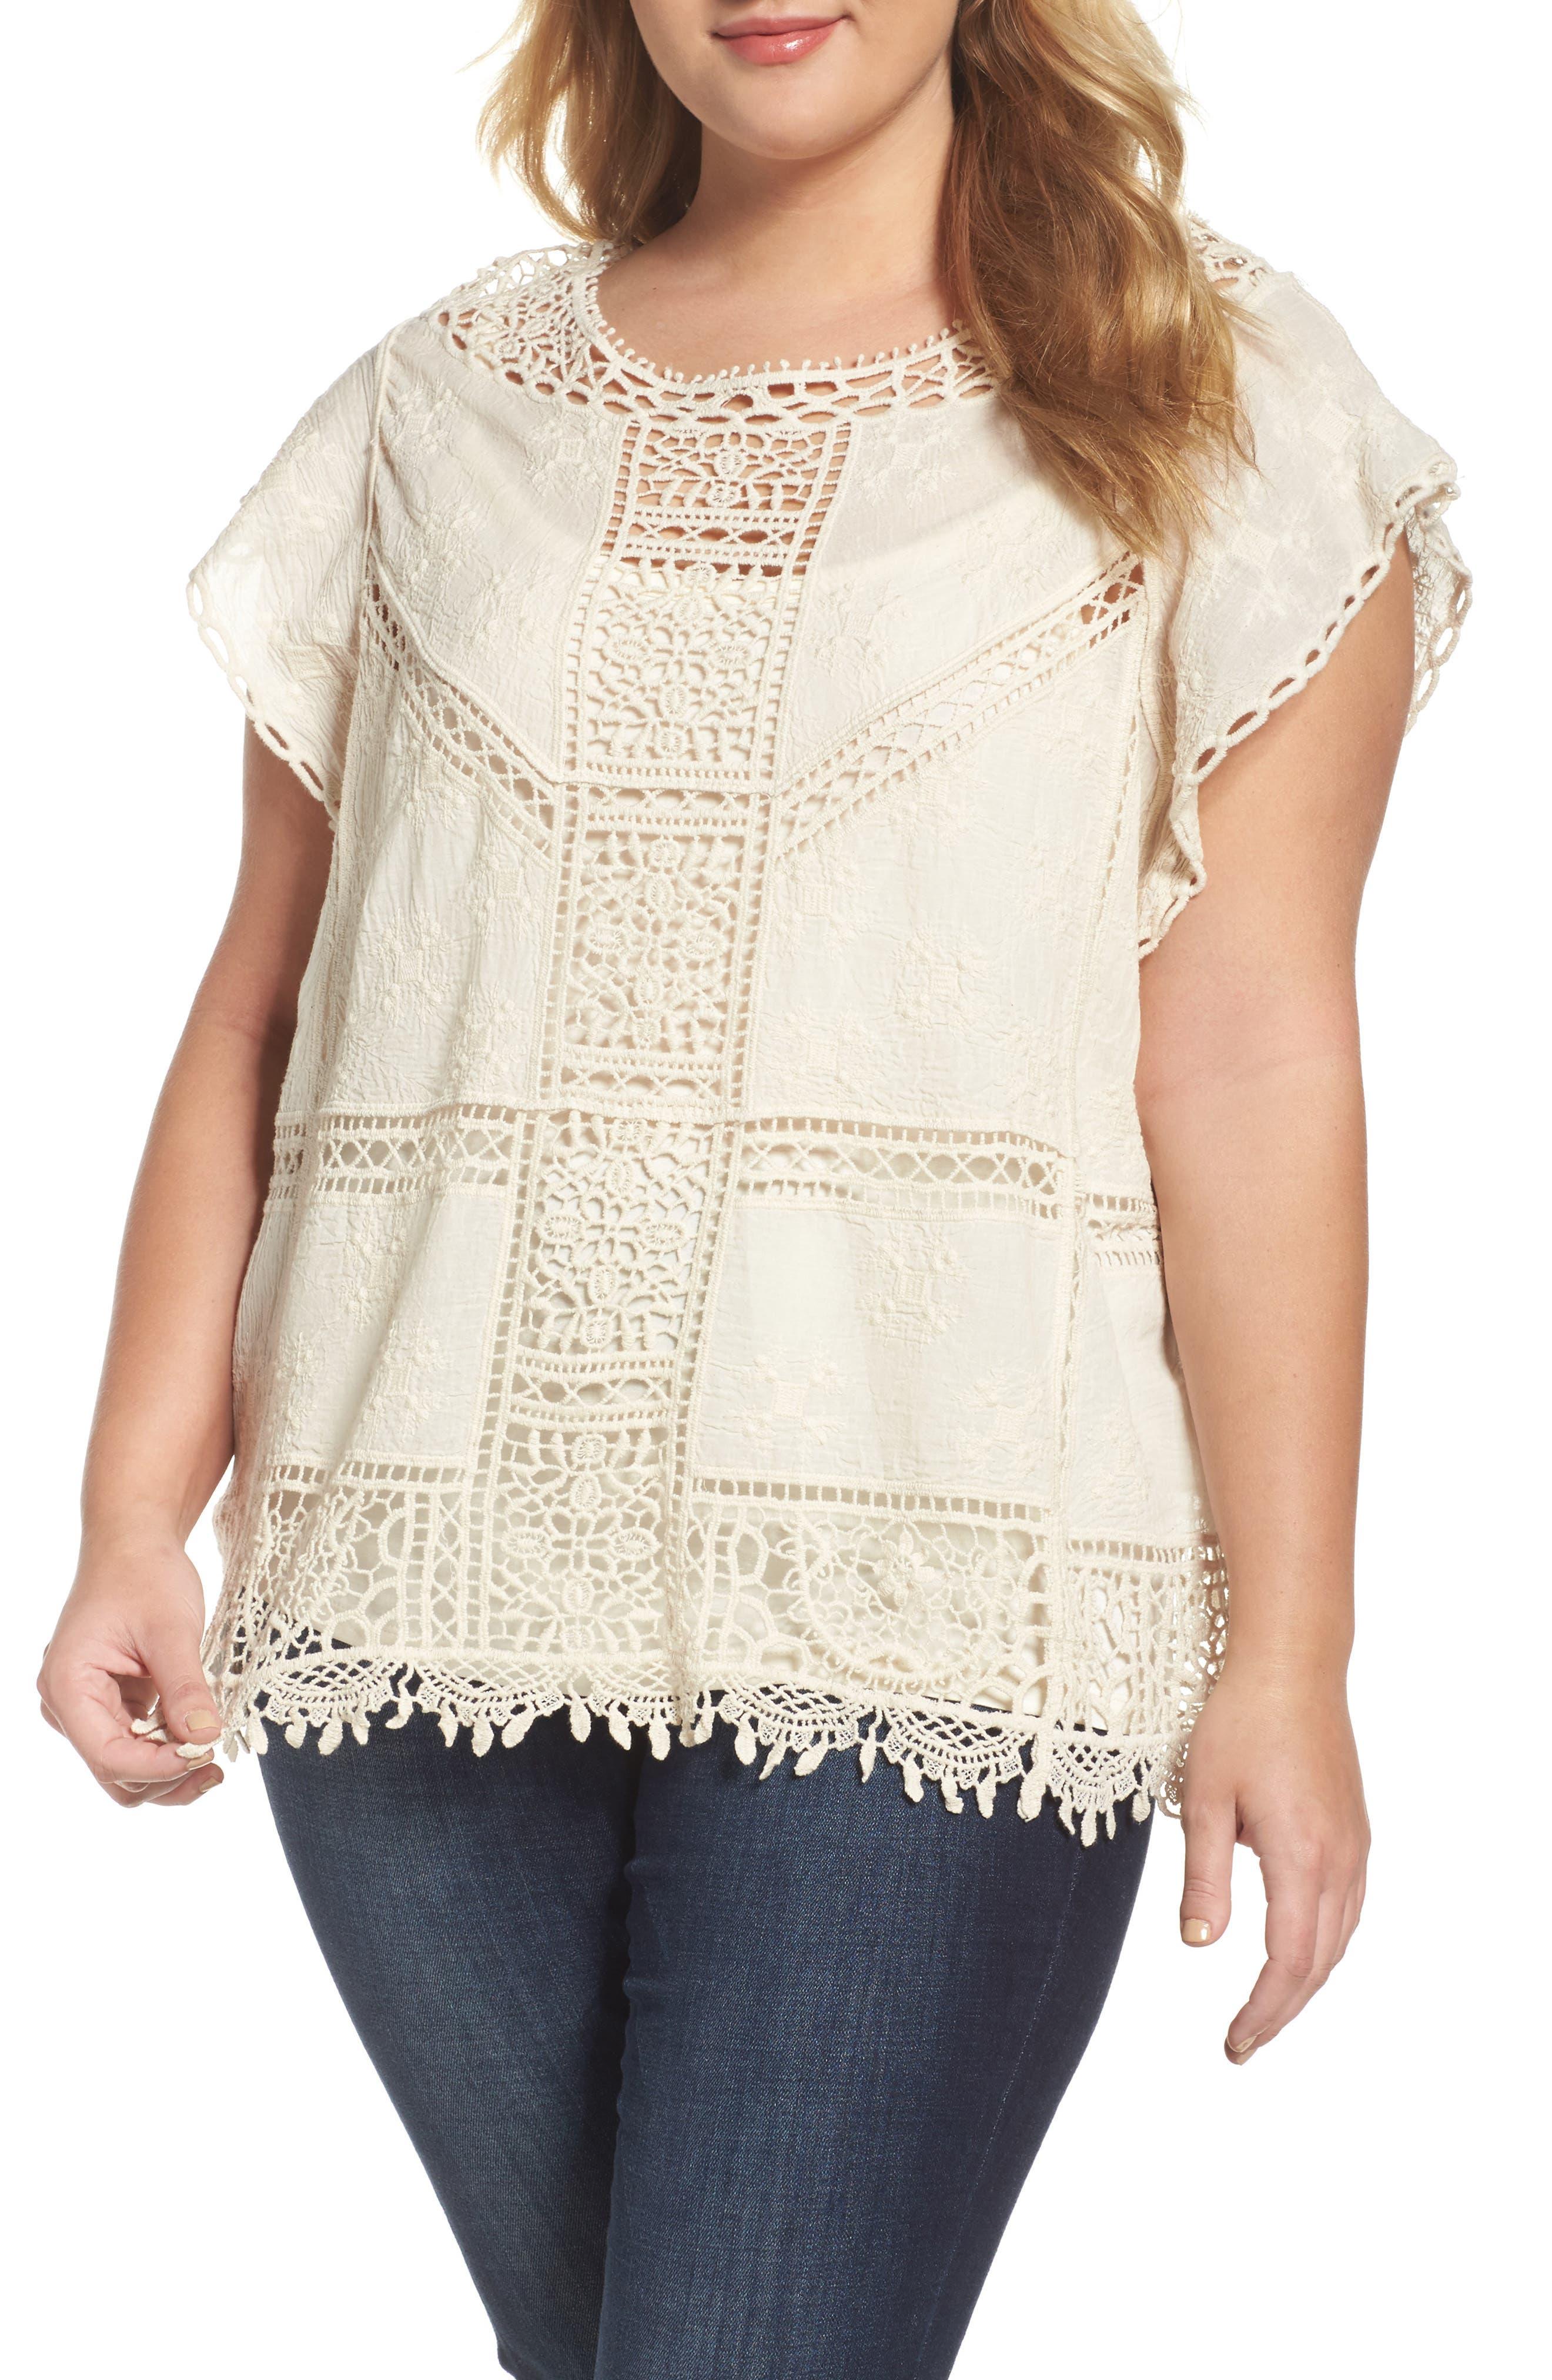 Alternate Image 1 Selected - Wit & Wisdom Flutter Sleeve Crochet Top (Plus Size) (Nordstrom Exclusive)